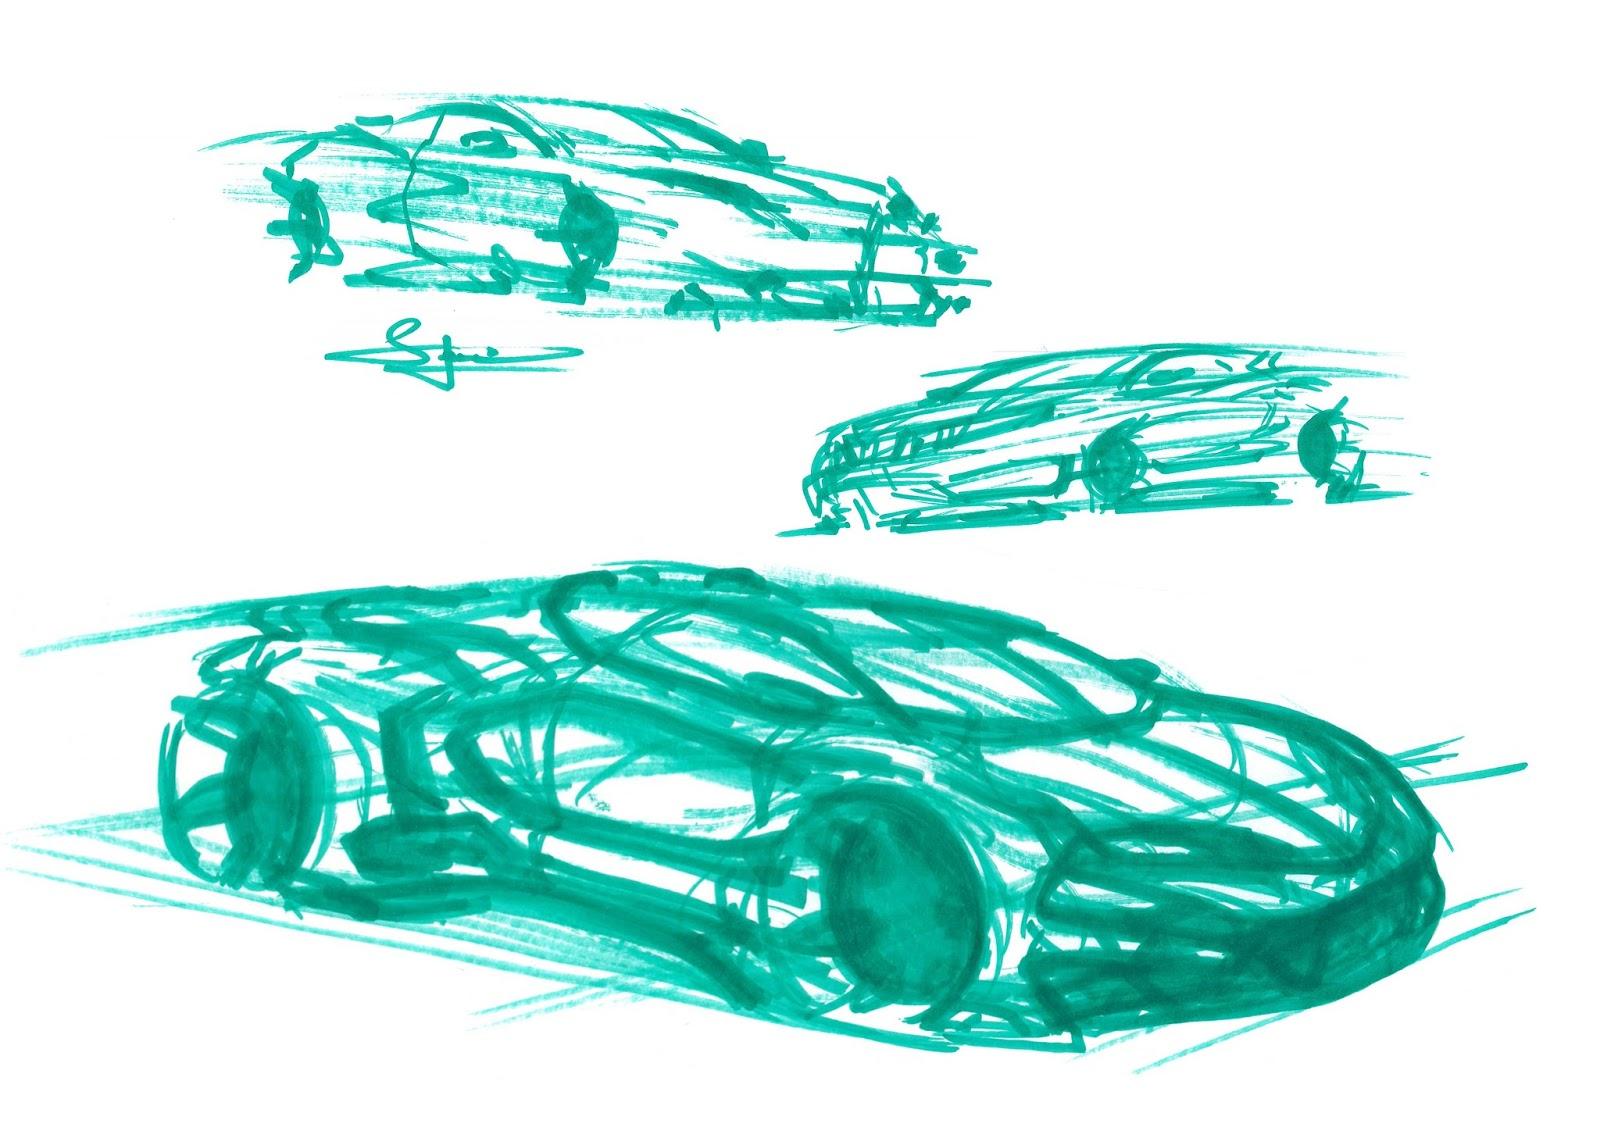 Simon Larsson - Sketchwall: Quick White Board Pen Sketches